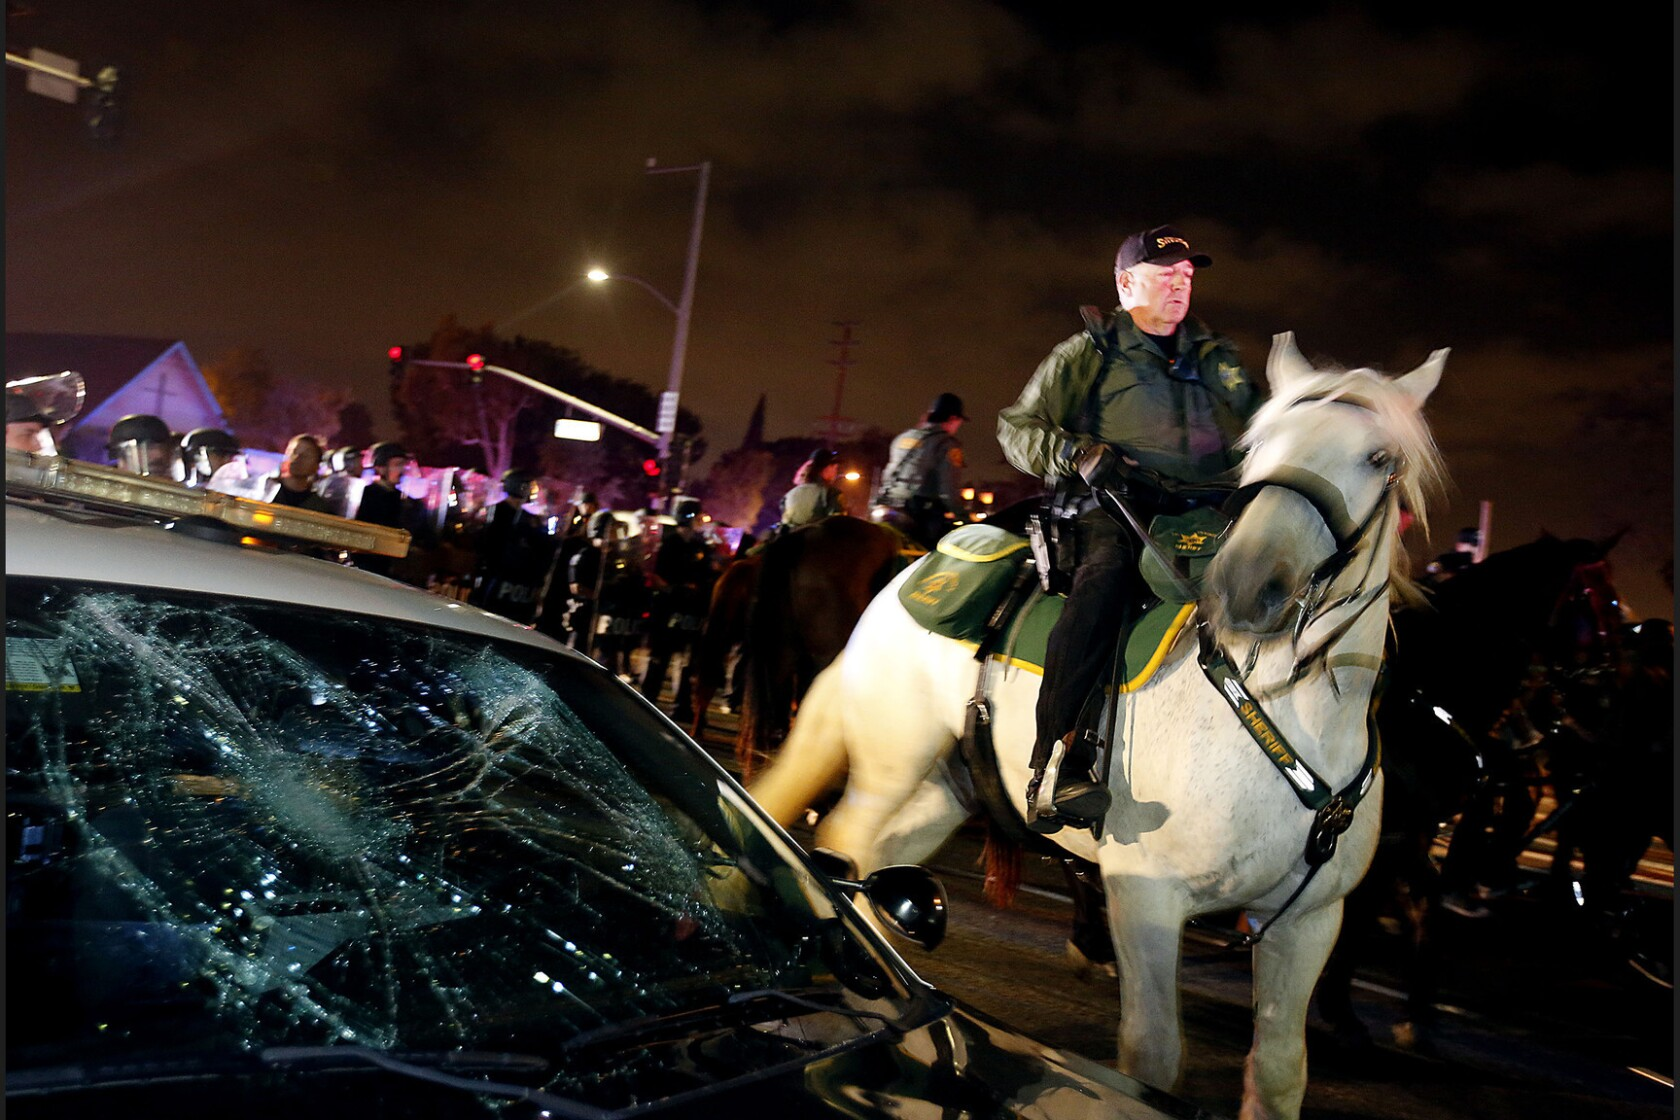 2 teens arrested in vandalism of Costa Mesa police cars